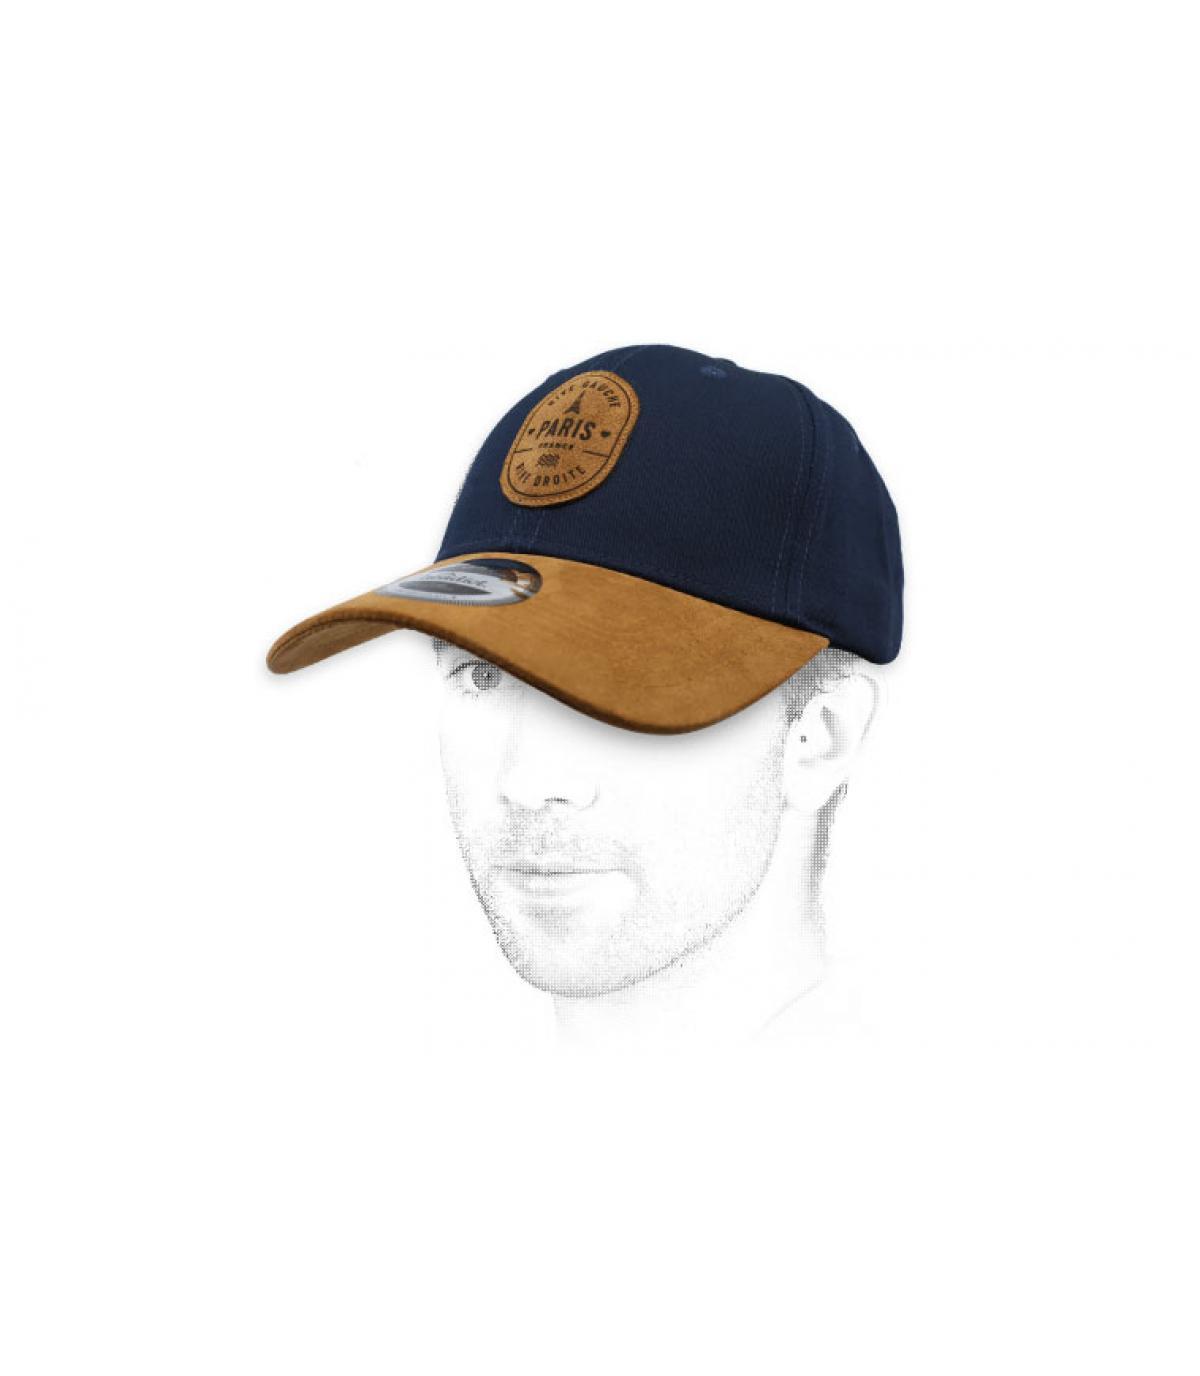 Cappellino in pelle scamosciata blu di Parigi